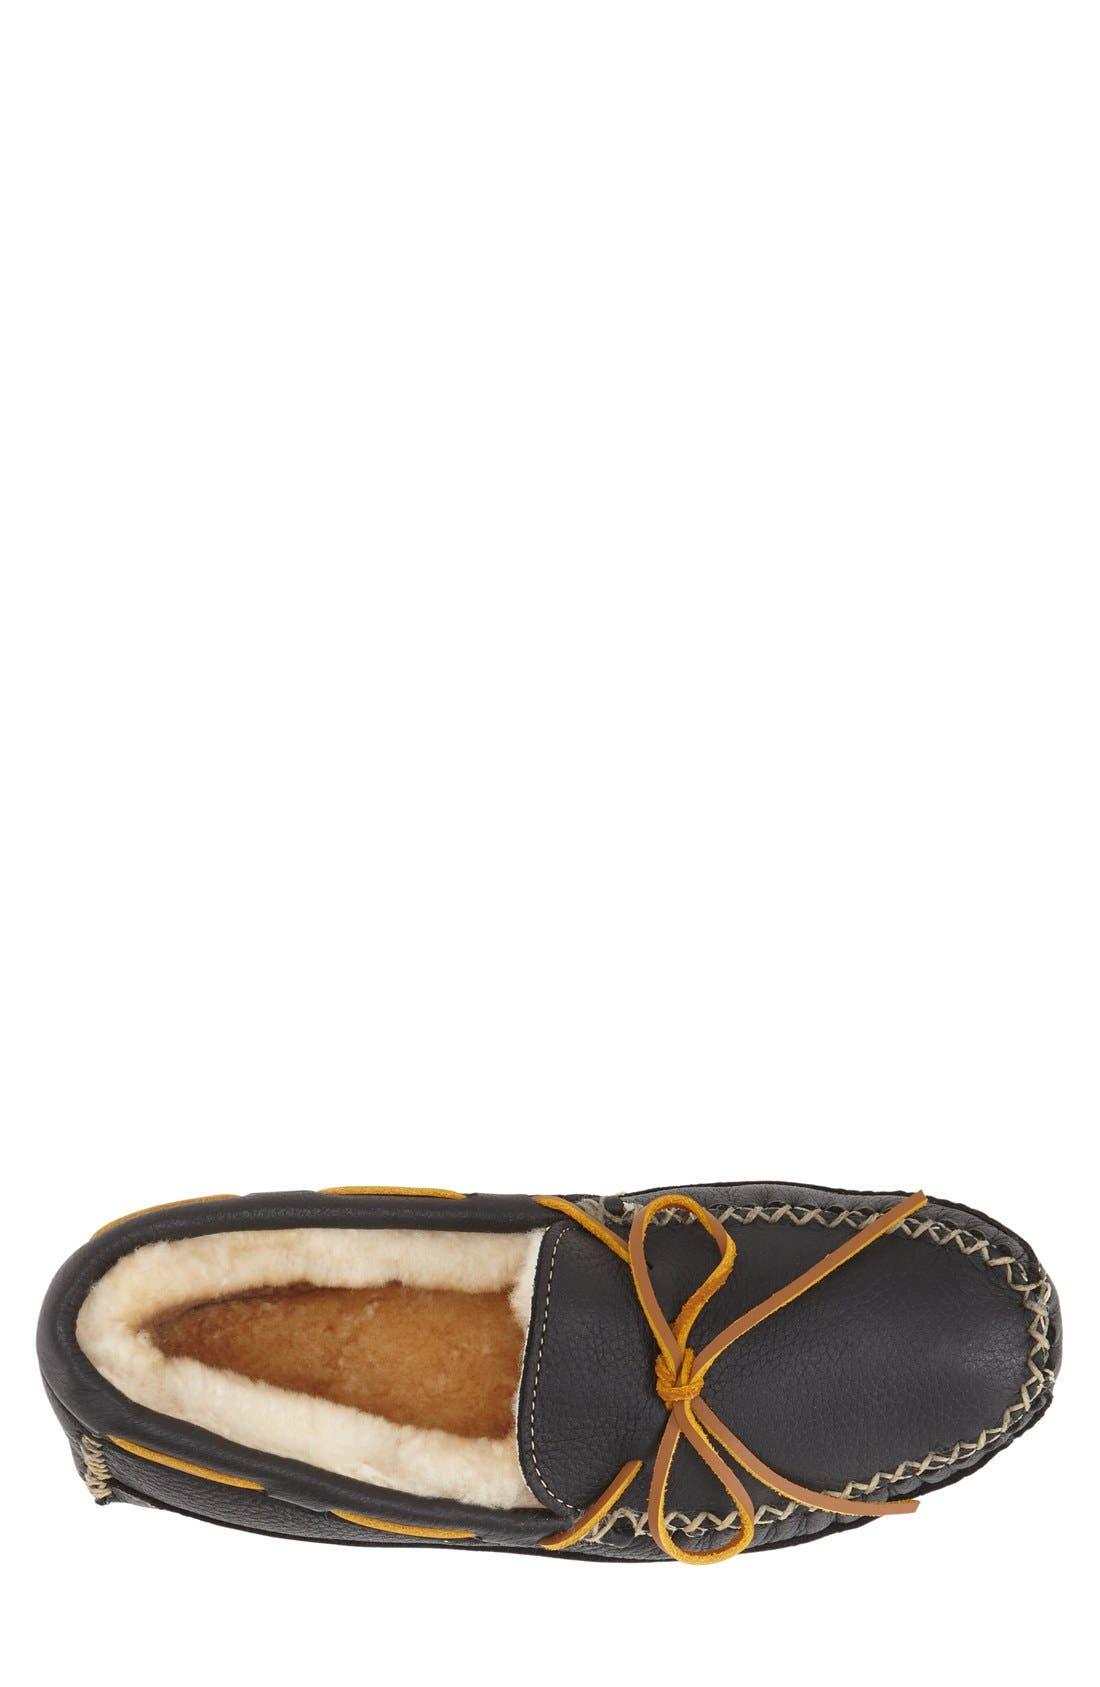 Genuine Shearling Leather Slipper,                             Alternate thumbnail 3, color,                             Black